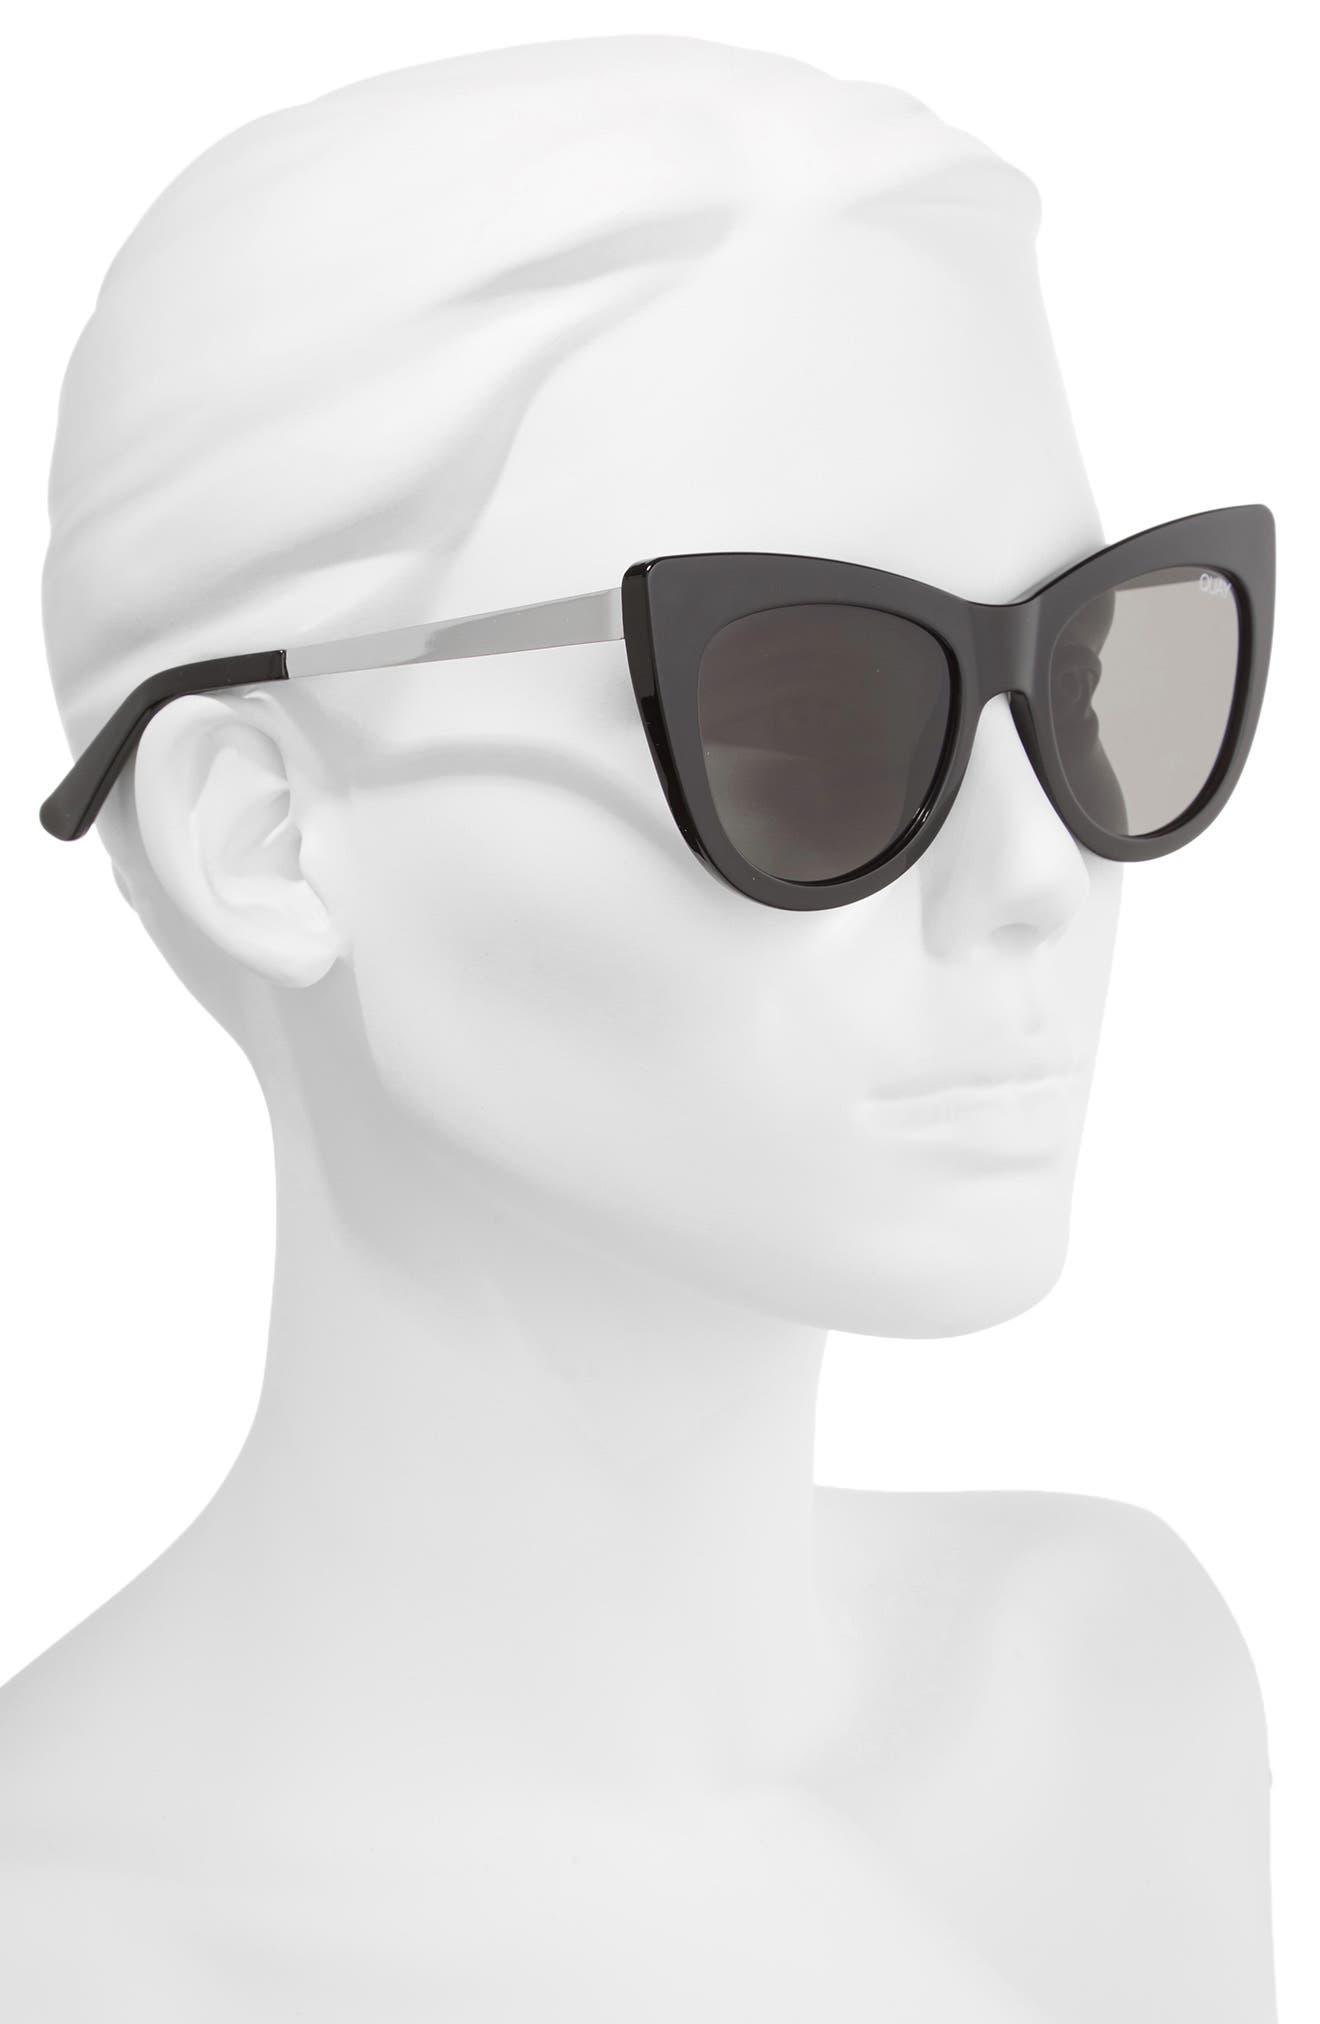 53mm Steal a Kiss Cat-eye Sunglasses,                             Alternate thumbnail 2, color,                             001